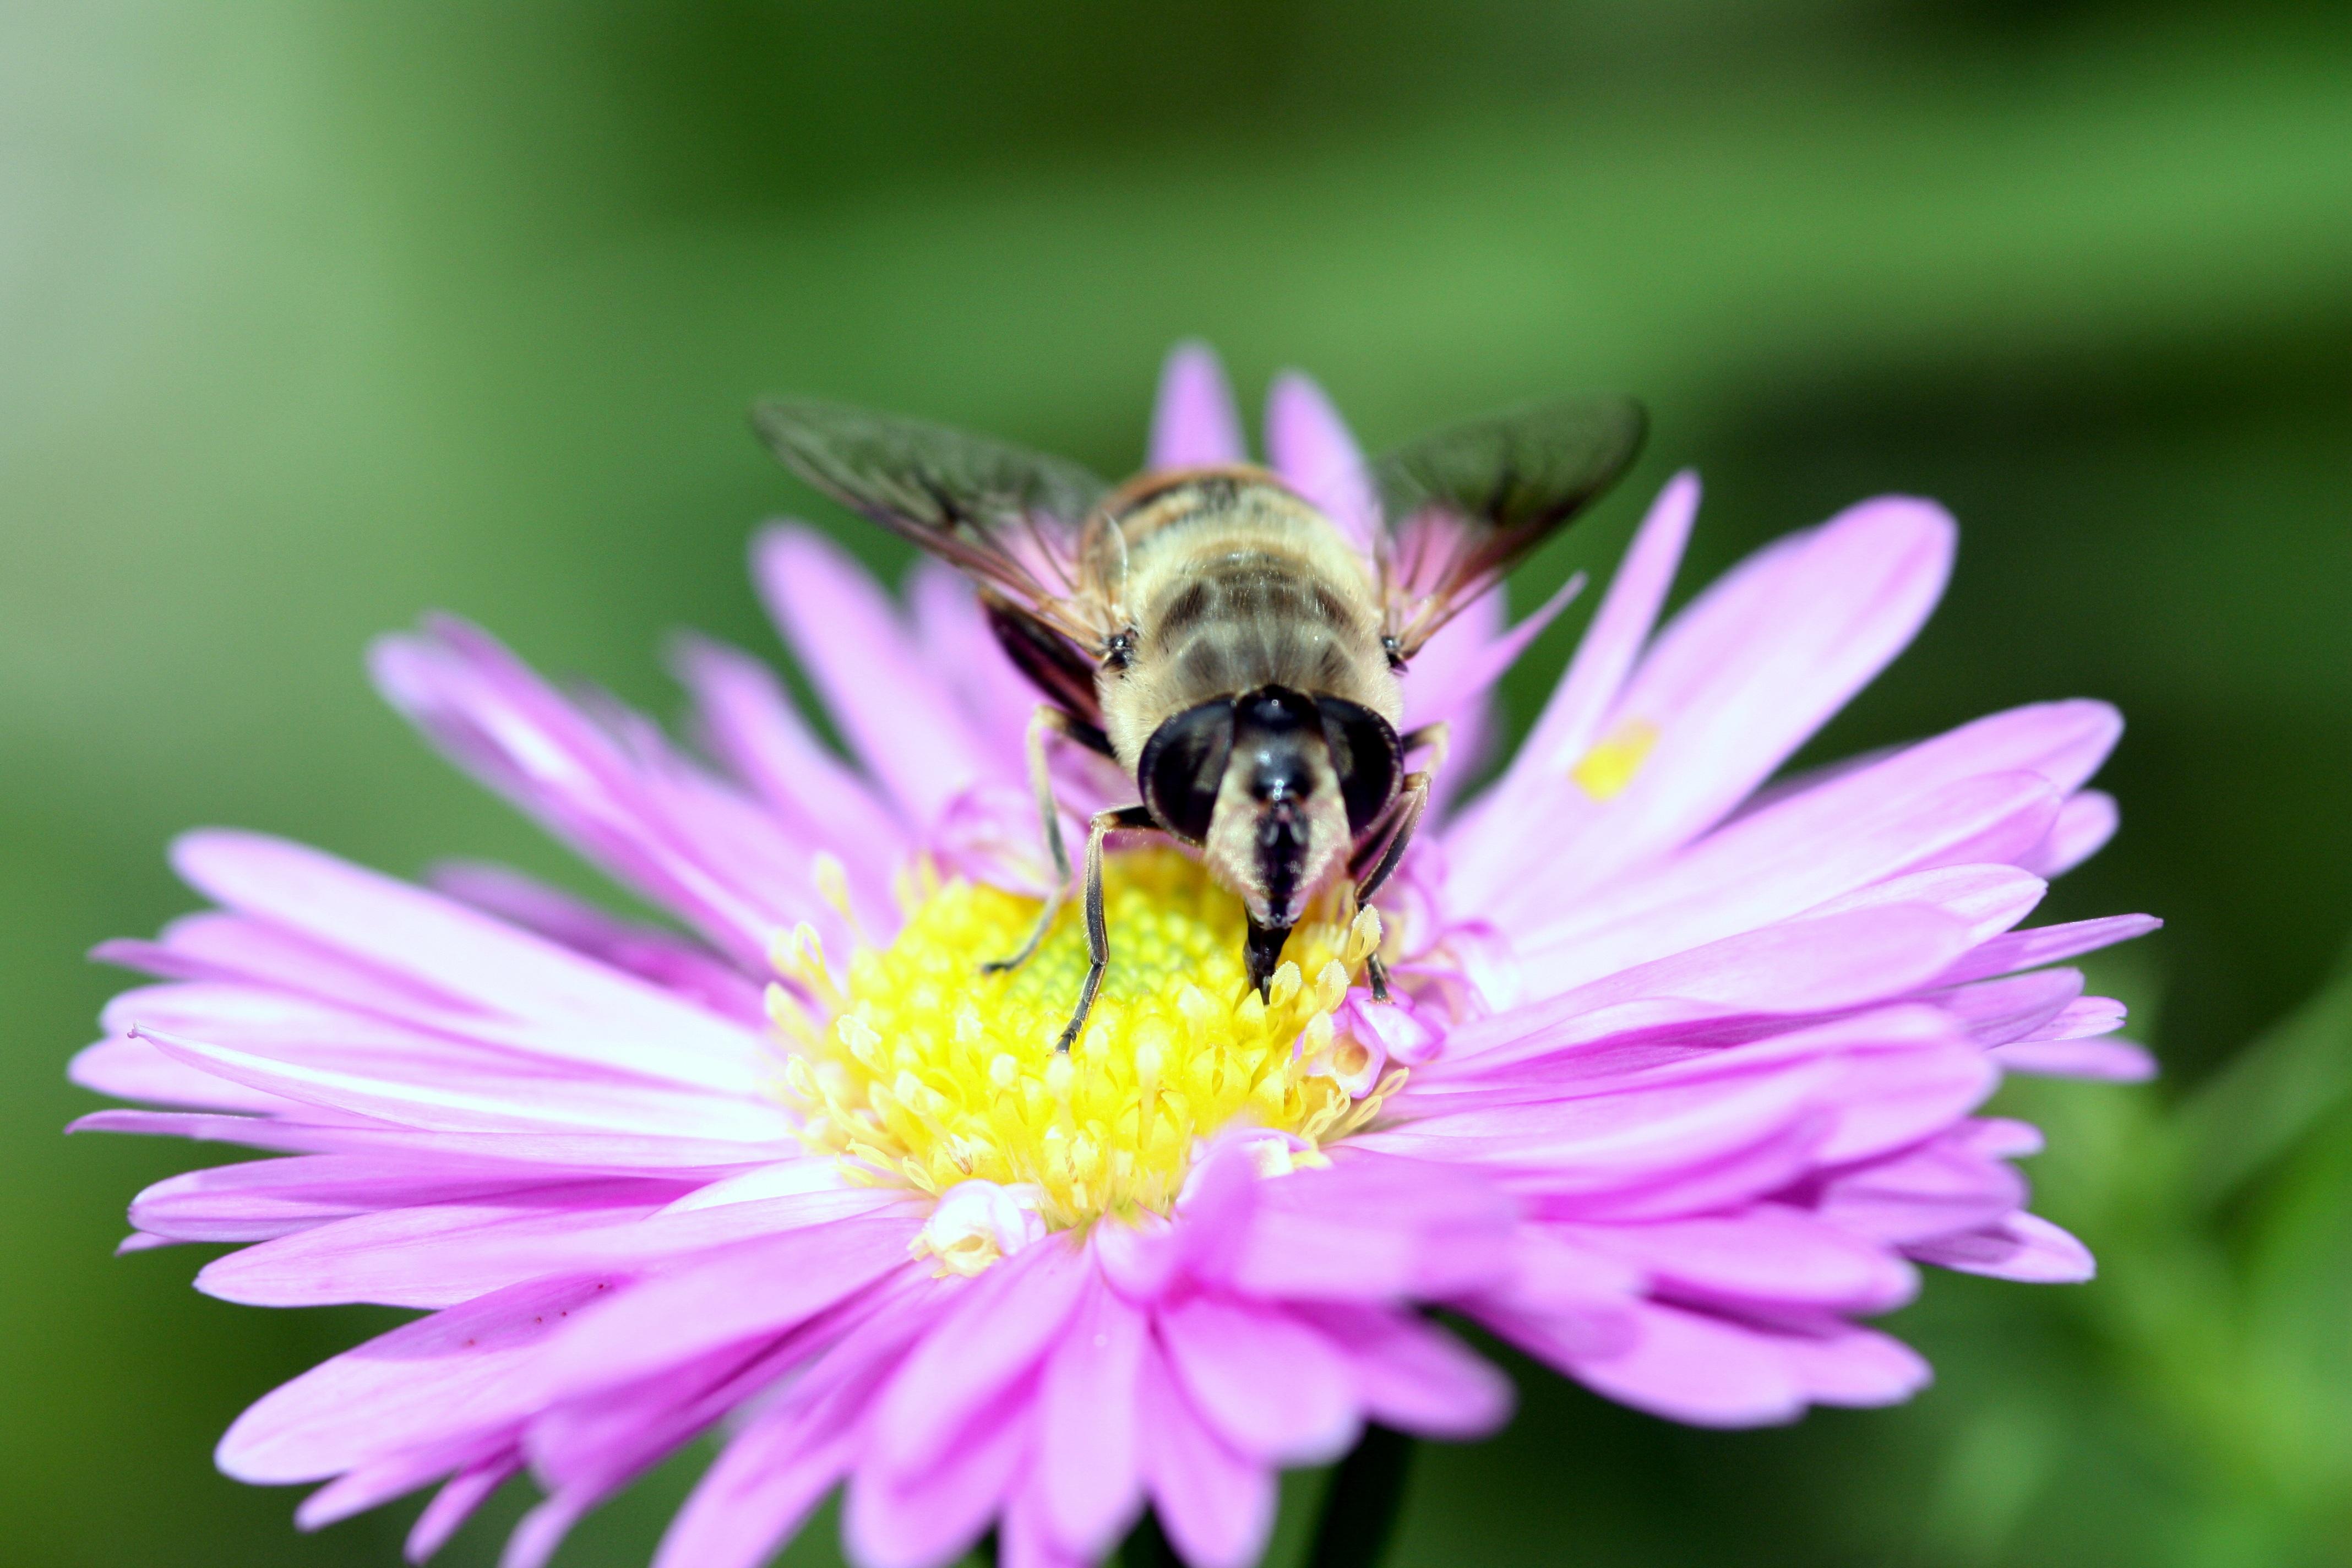 Free Images : nature, outdoor, blossom, light, plant, flower, petal ...